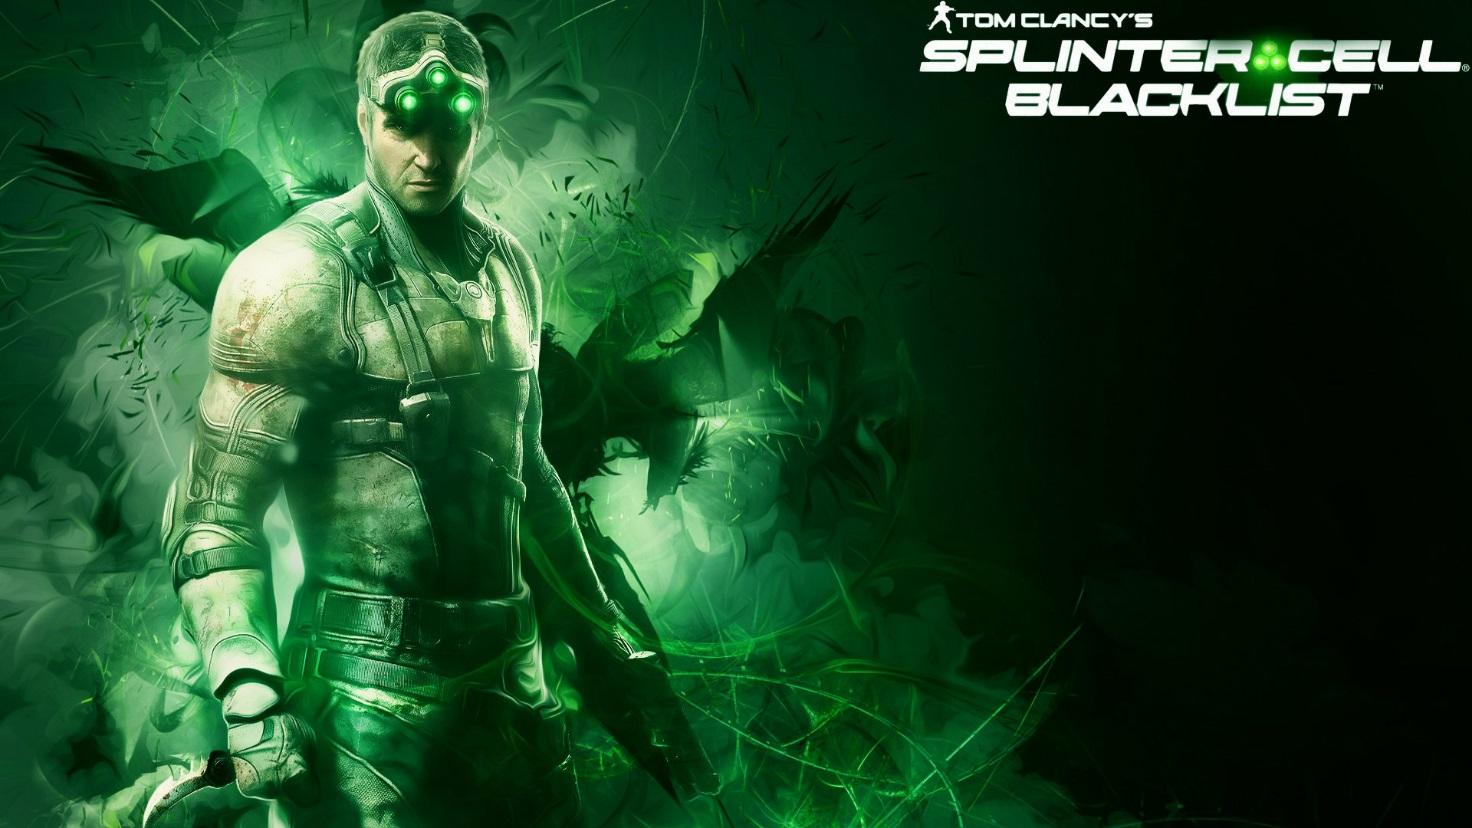 Картинки по запросу Splinter Cell: Blacklist